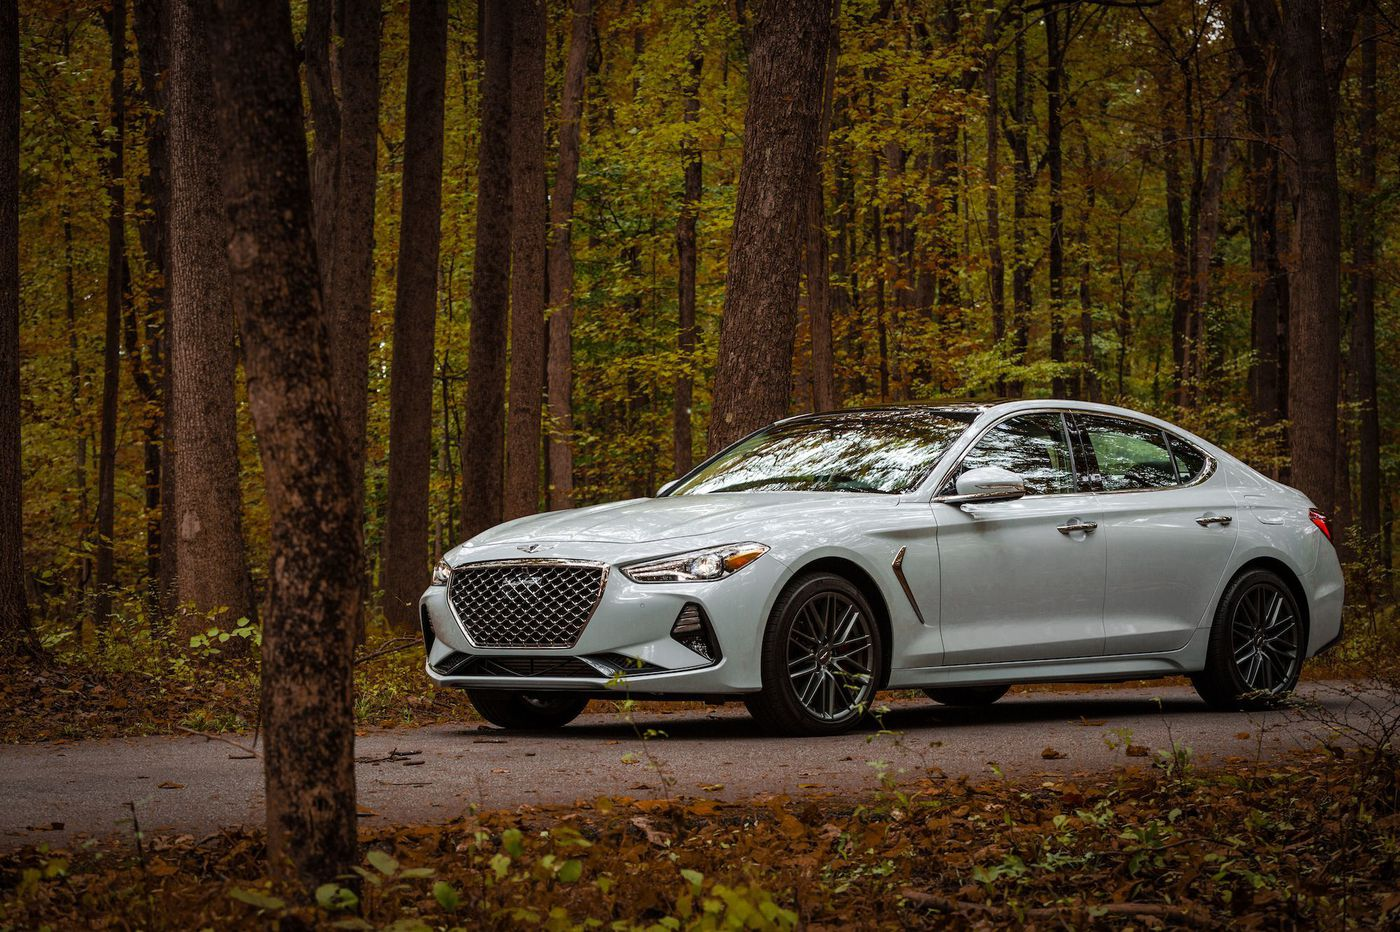 Genesis begets the G70, a new smaller sporty sedan